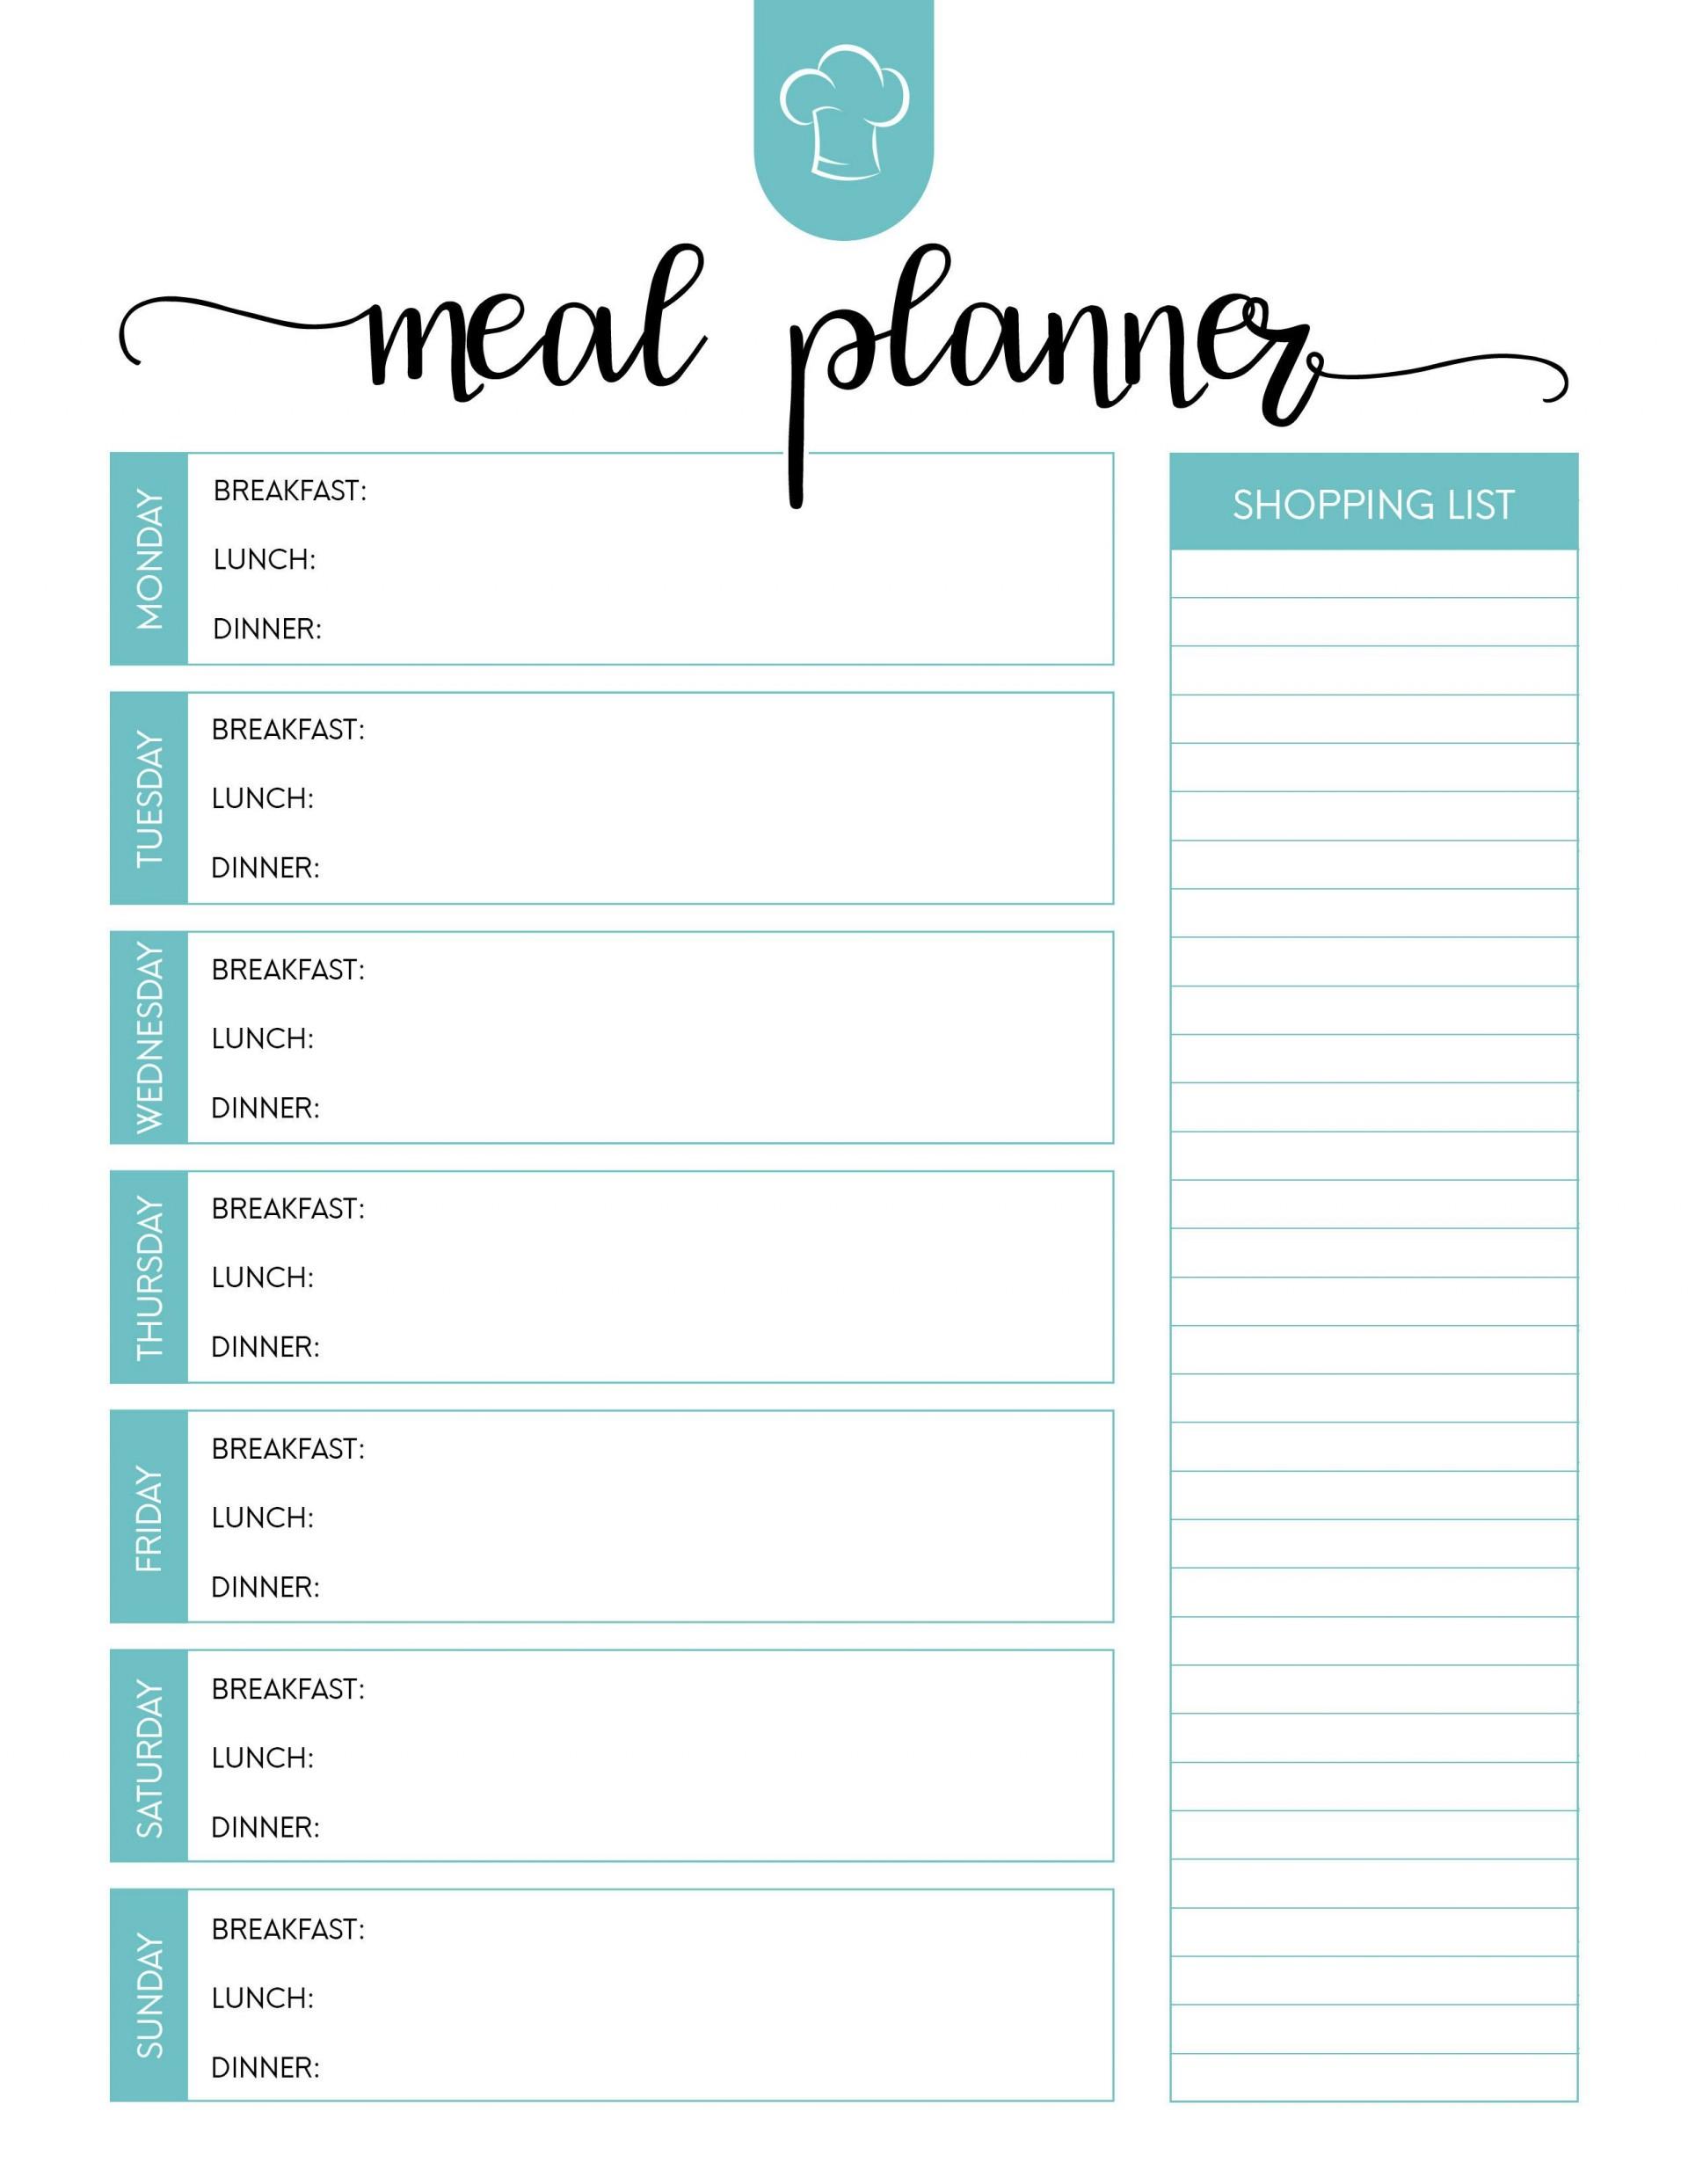 025 Template Ideas Free Menu Planner Meal Plan Awesome Regarding Menu Planning Template Word